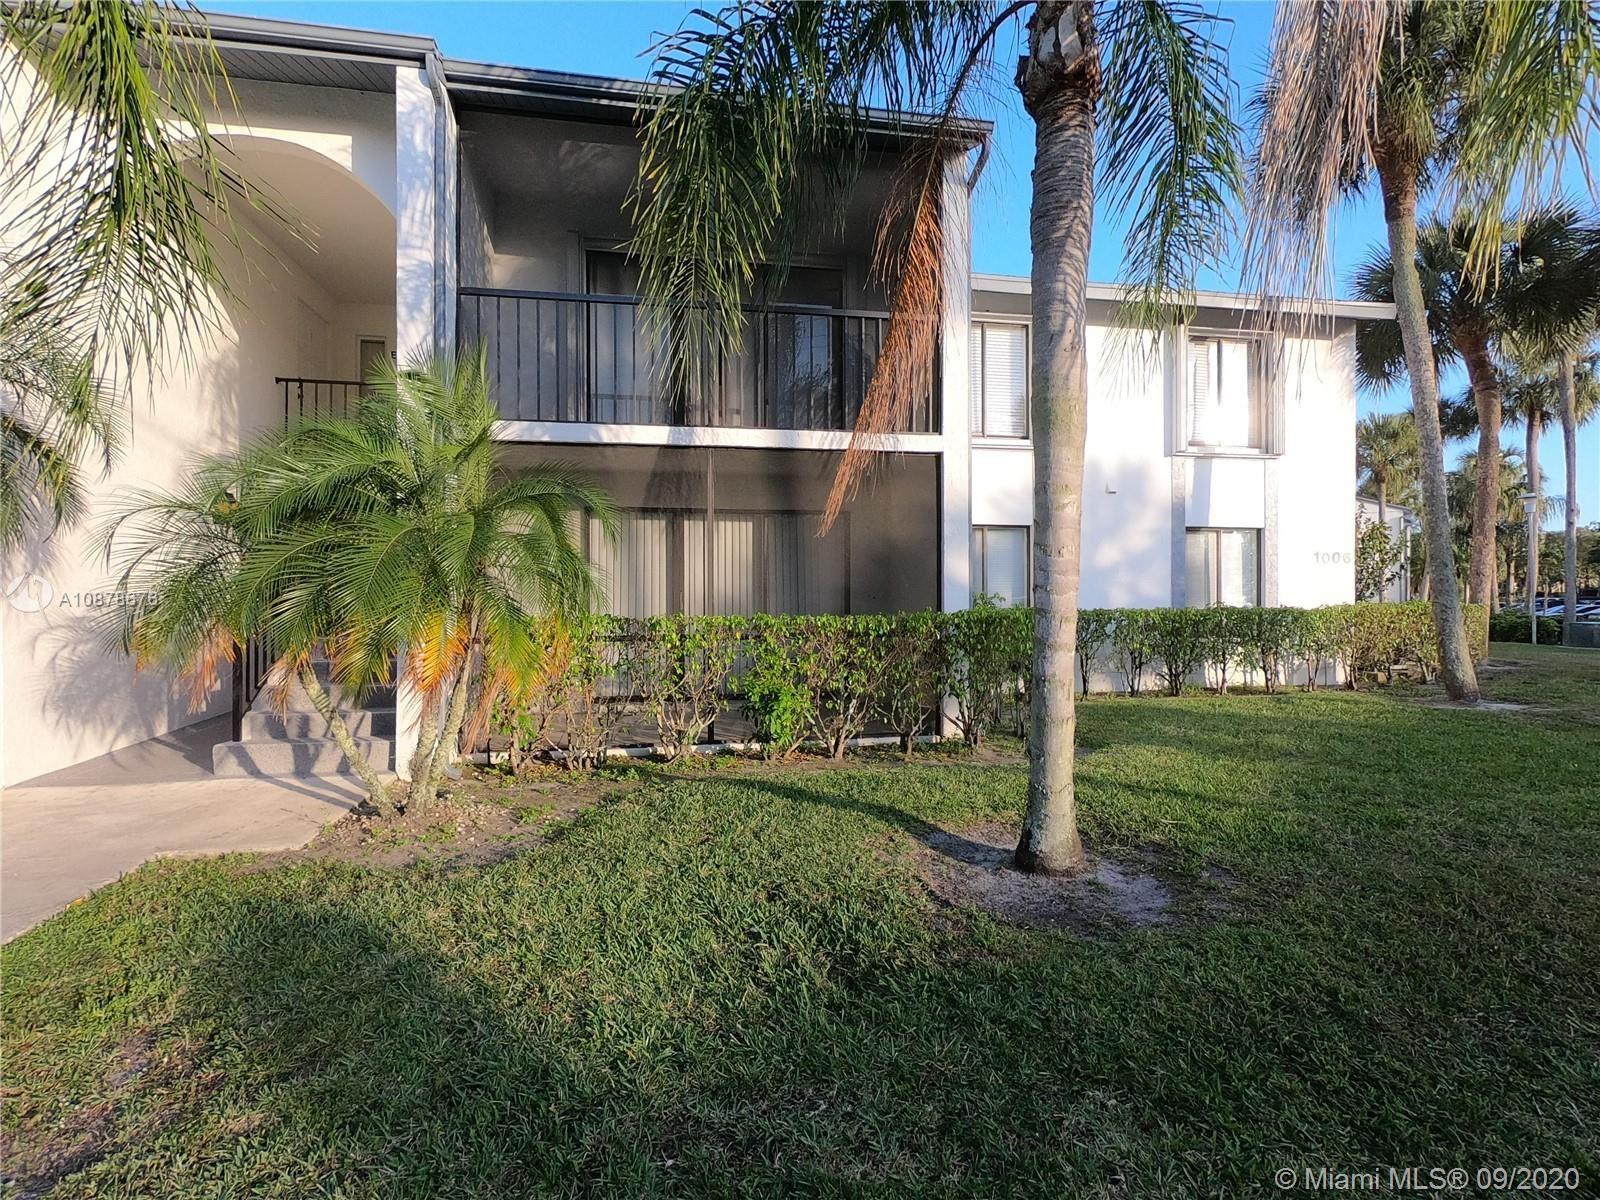 1006 Green Pine Blvd #H1, West Palm Beach, FL 33409 - MLS#: A10878676